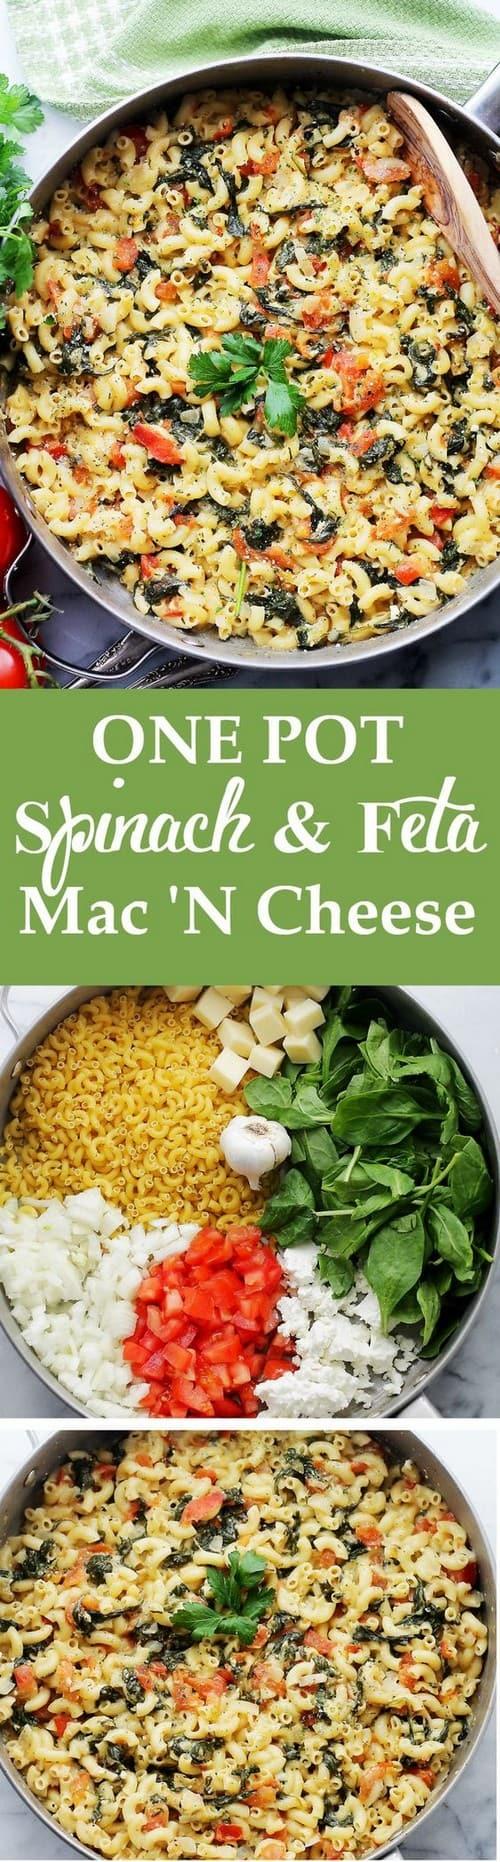 Mediterranean One Pot Spinach & Feta Macaroni and Cheese